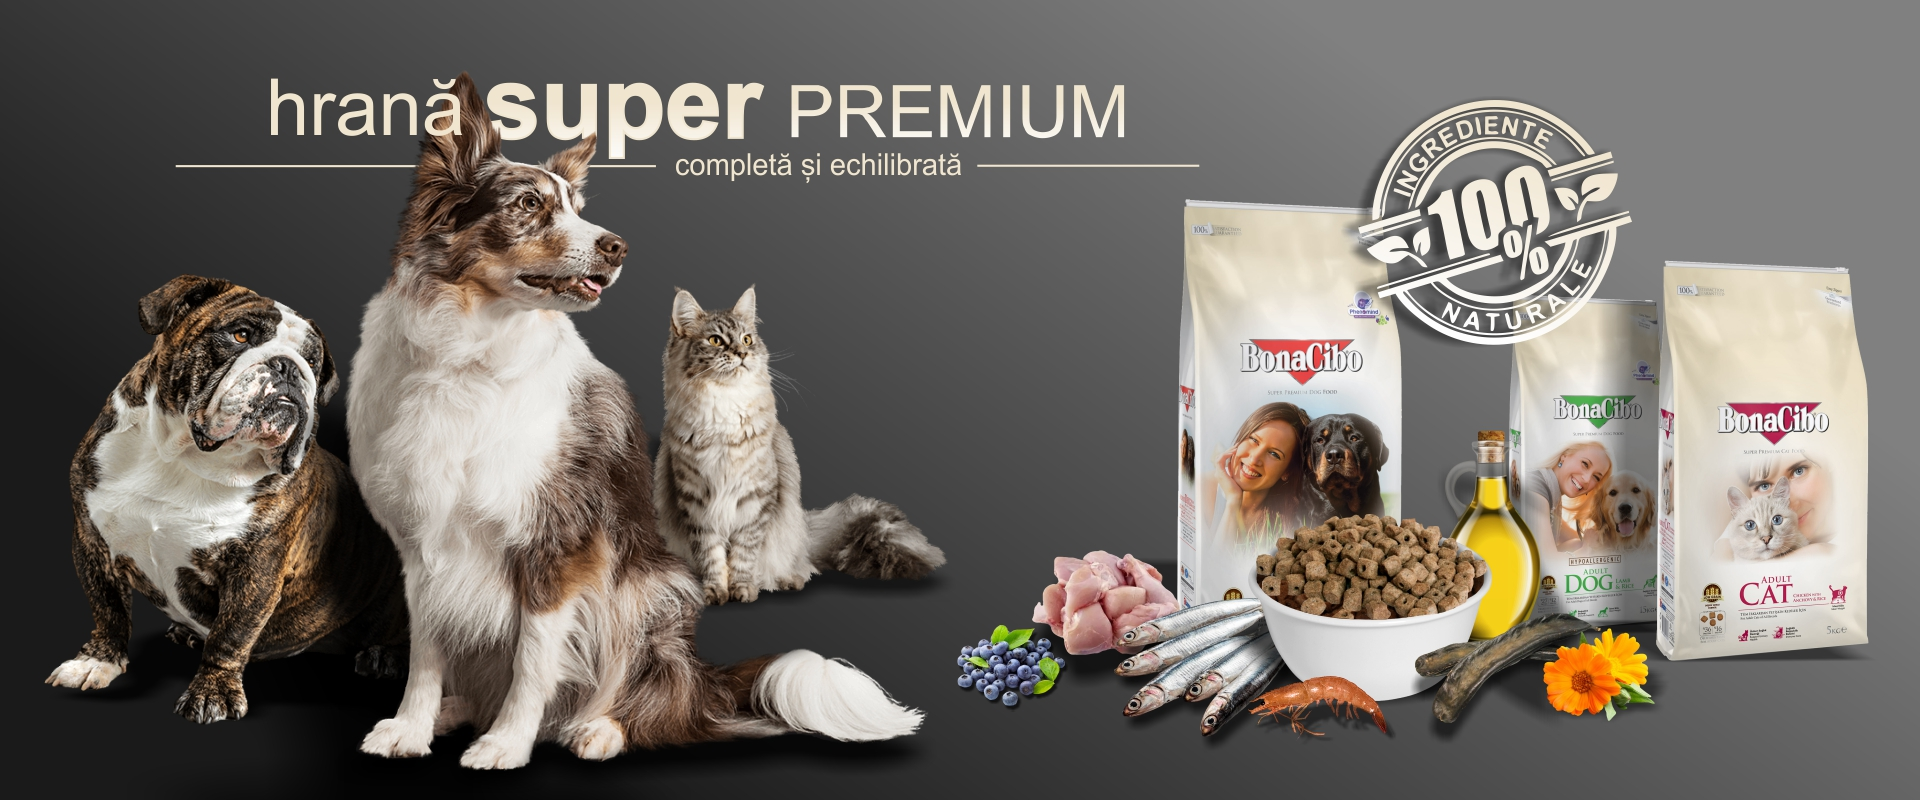 Bonacibo Hrana Super Premium Mobil